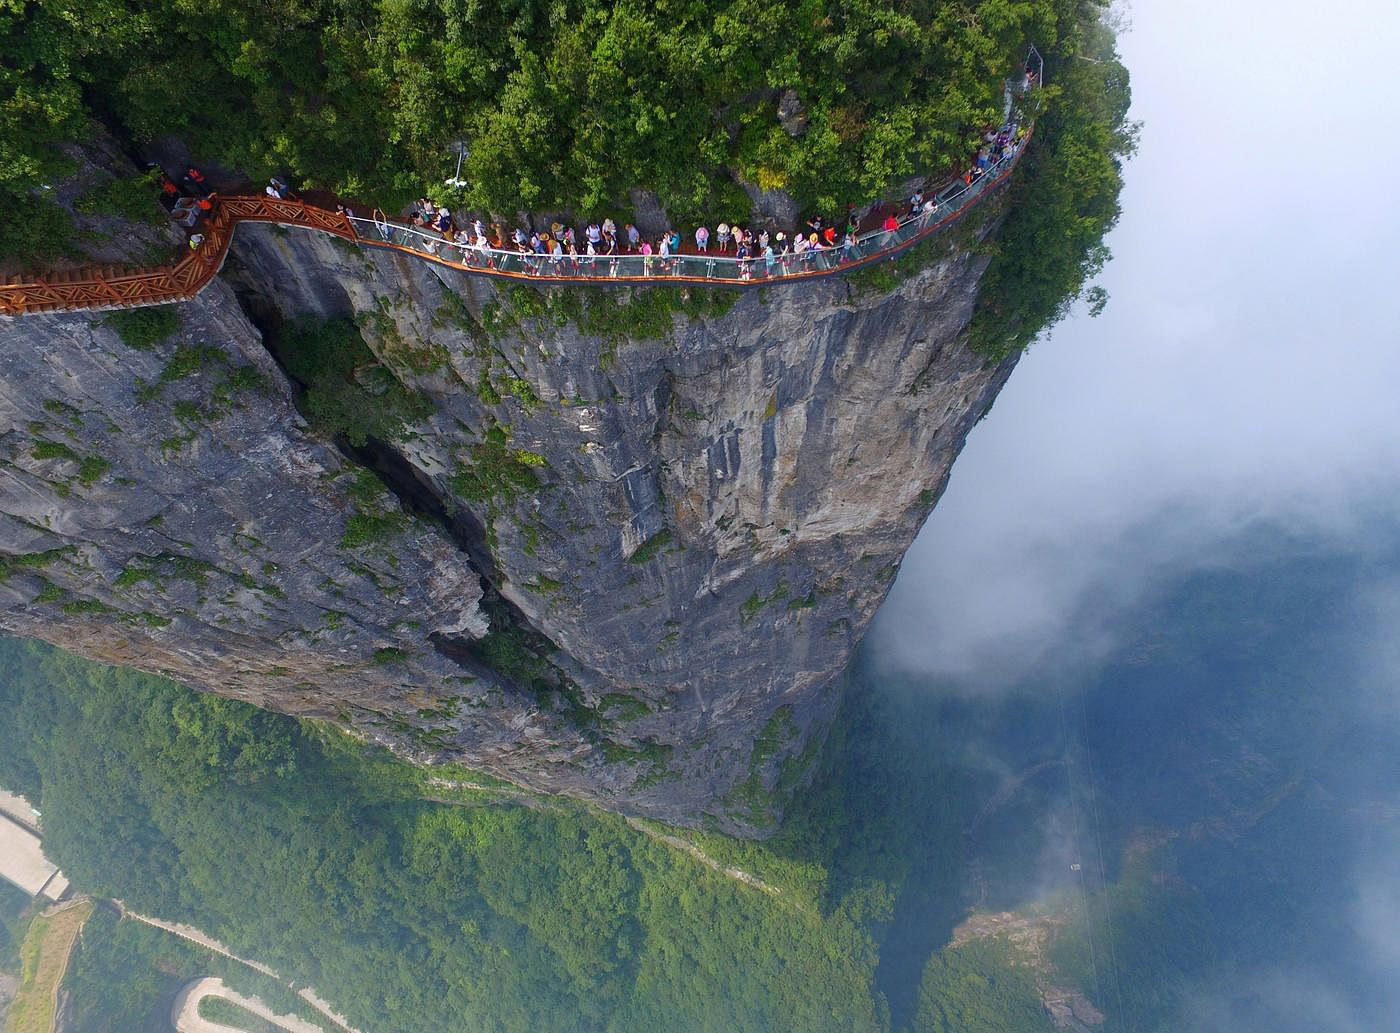 China opens longest glass bottom bridge in world